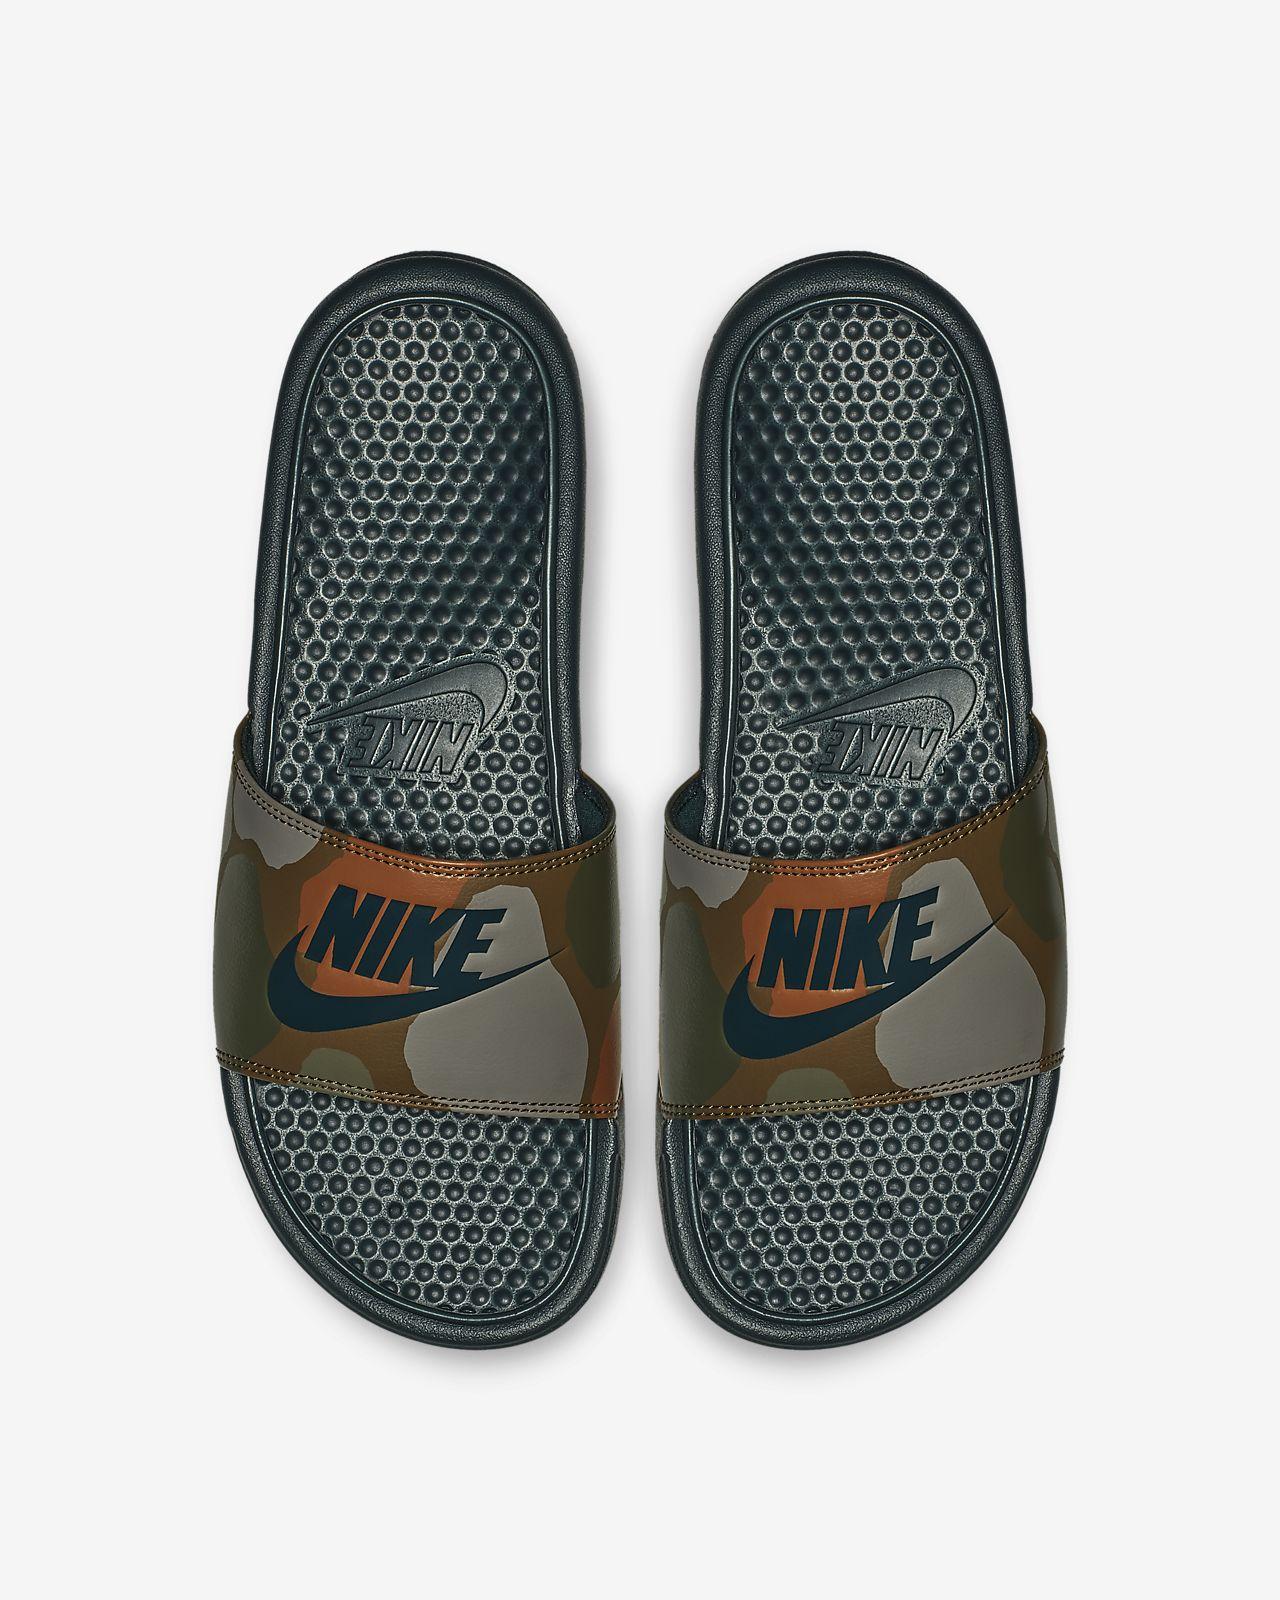 finest selection e551a 12484 ... Chancla para hombre Nike Benassi JDI Printed